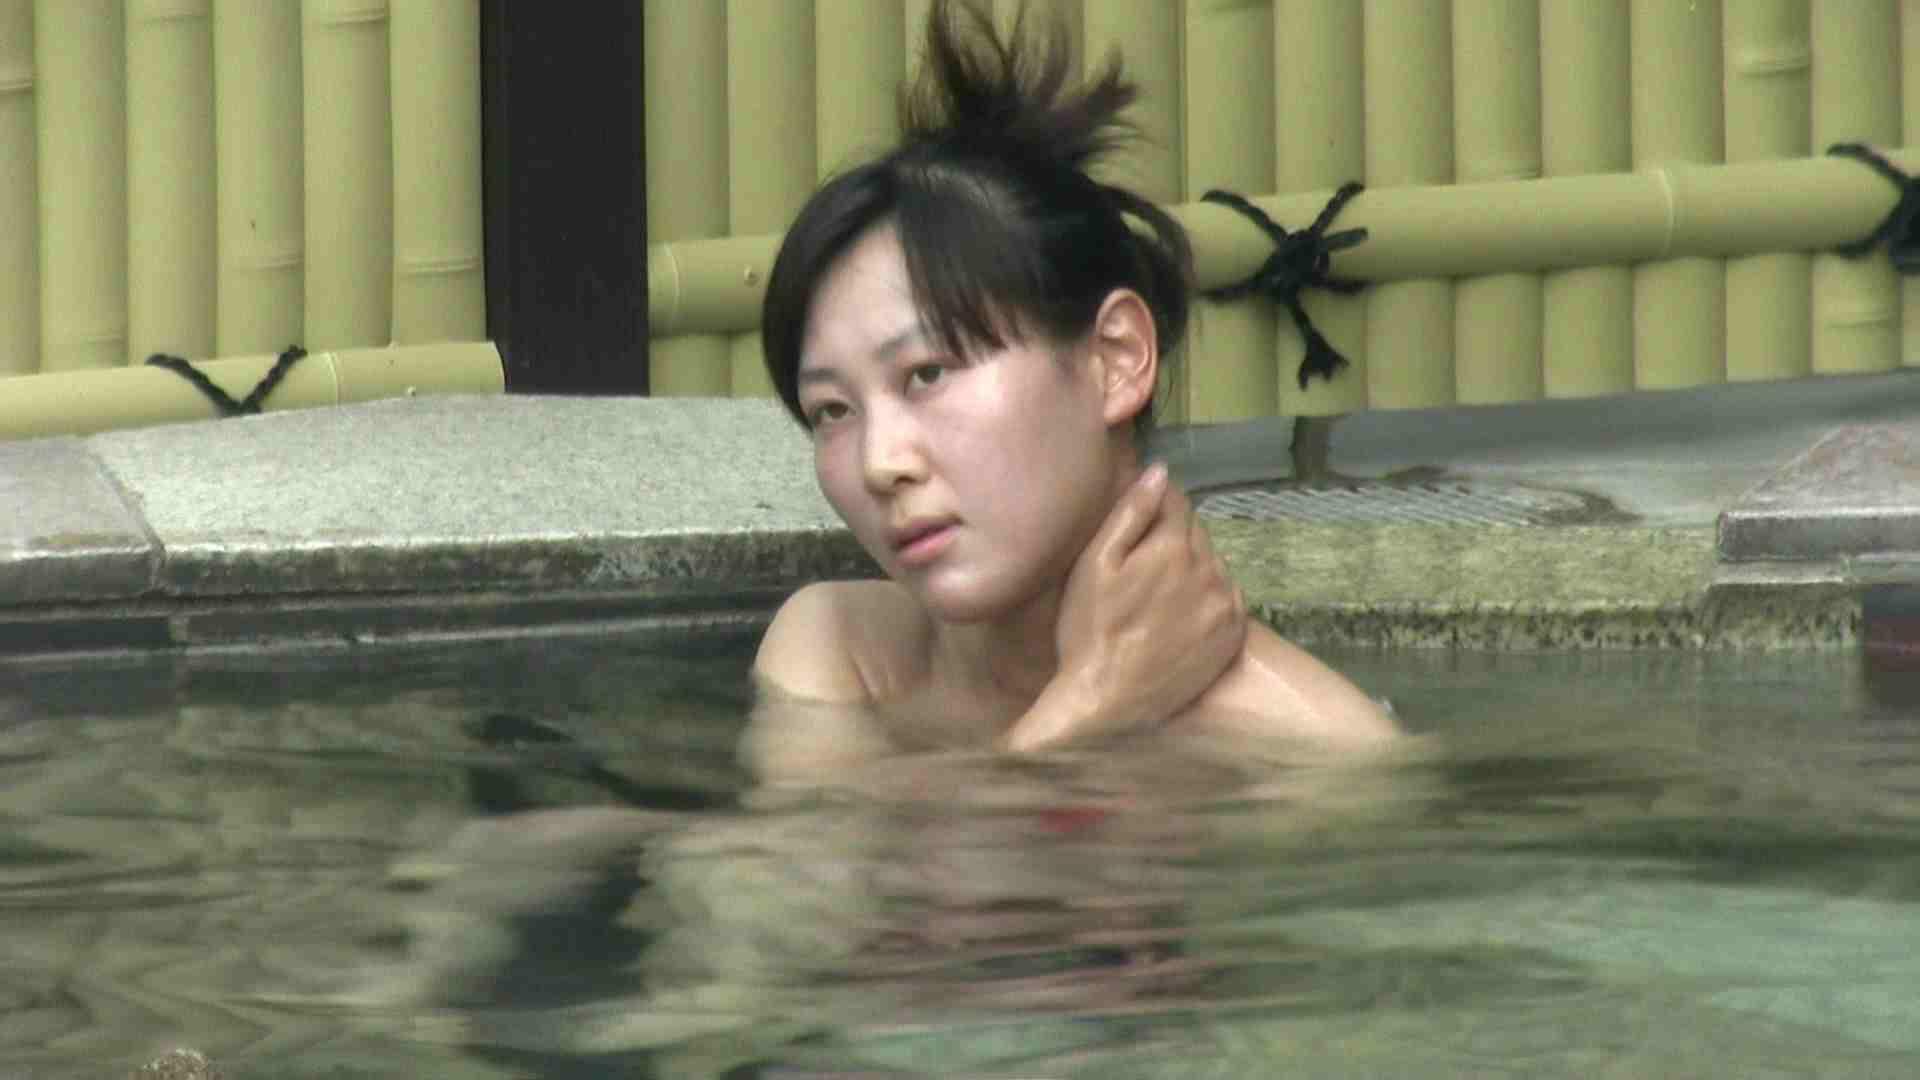 Aquaな露天風呂Vol.665 露天風呂編  86PIX 58